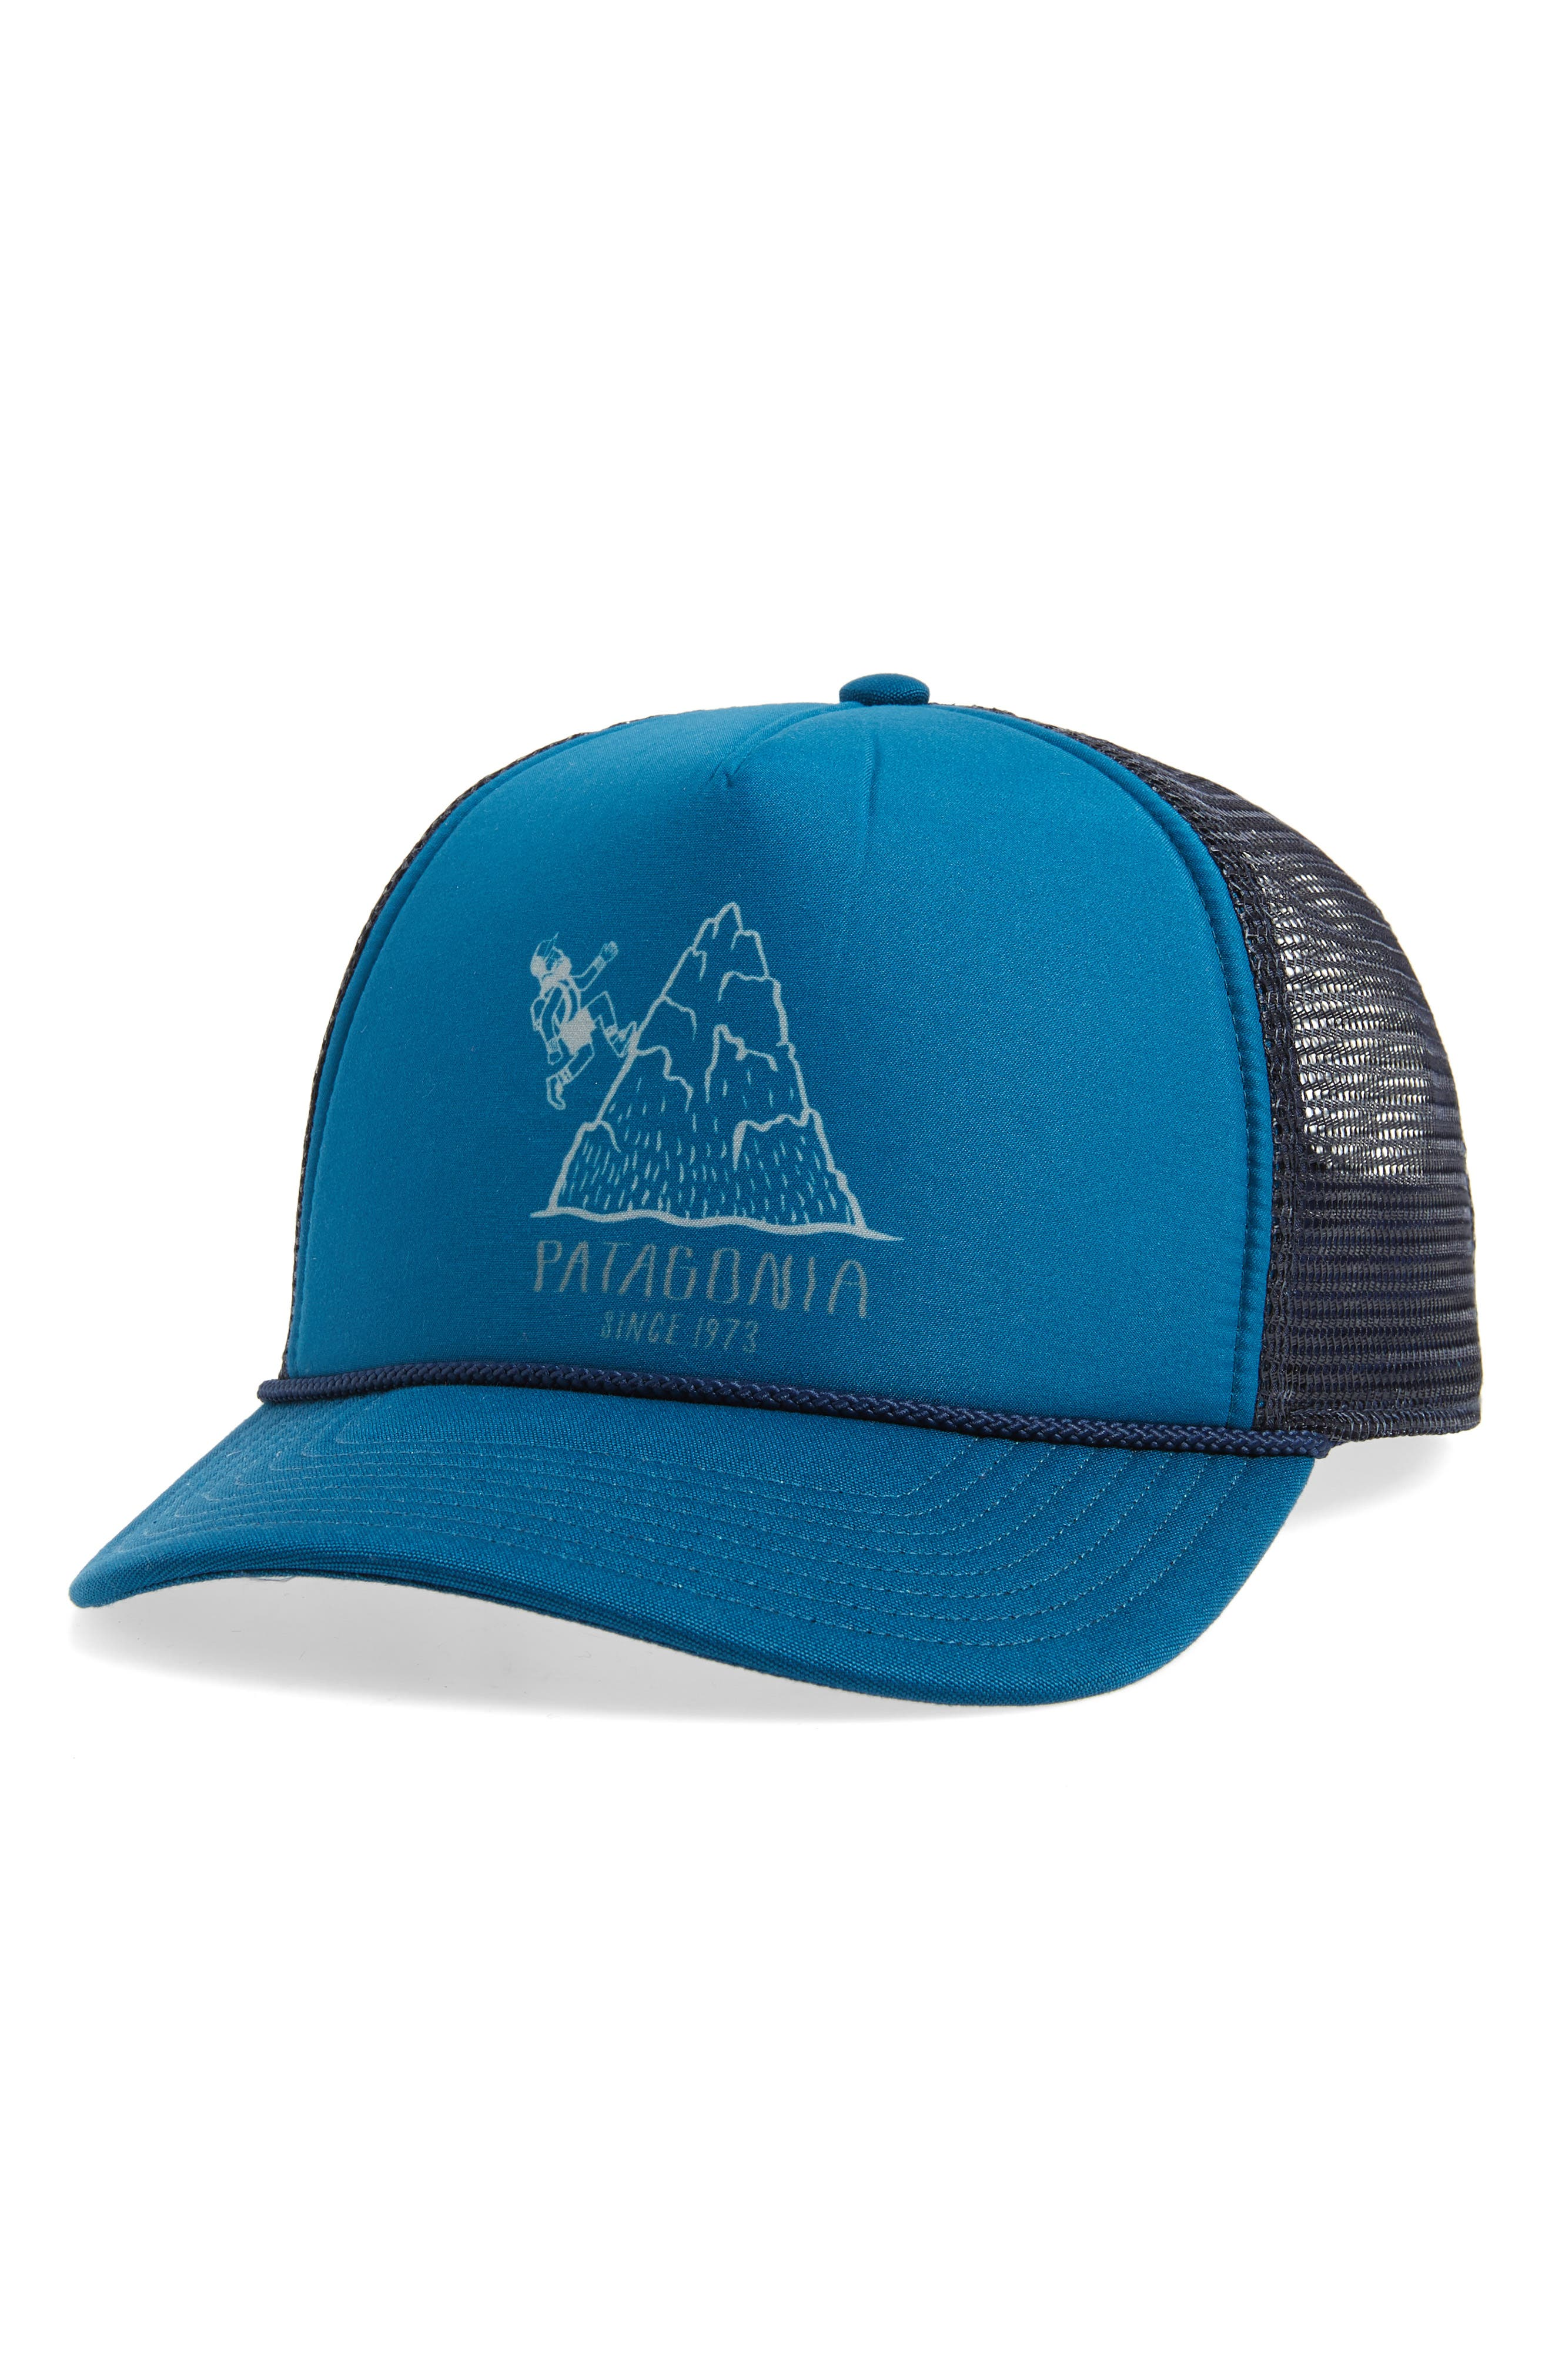 Hoofin' It Interstate Trucker Hat,                         Main,                         color, 400